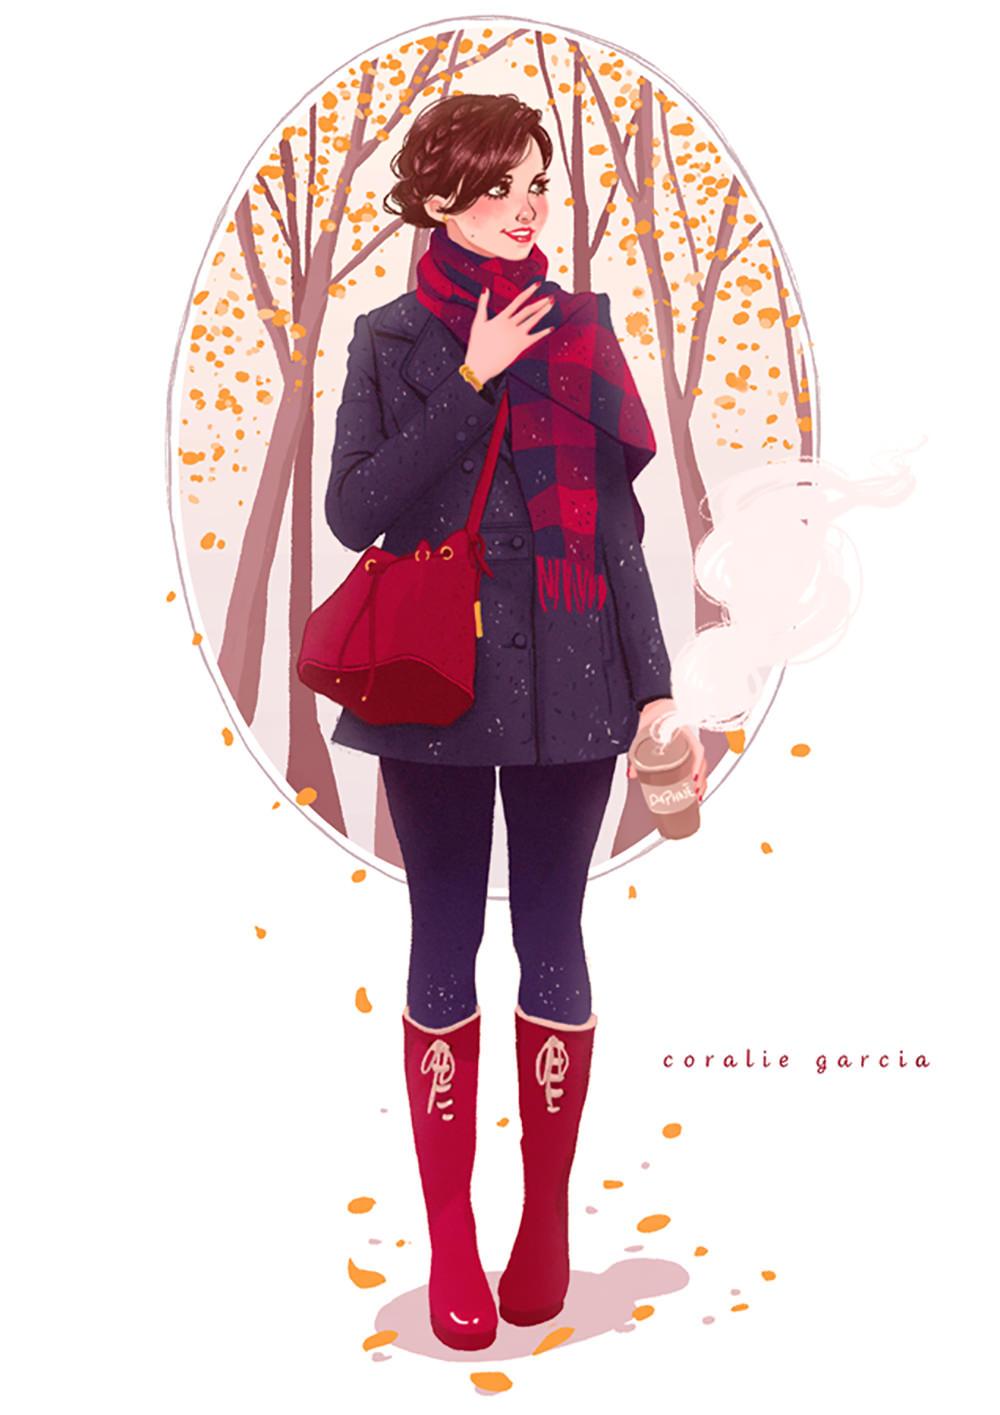 Blog-Mode-And-The-City-Lifestyle-Cinq-Petites-Choses-207-illustration-coralie-garcia